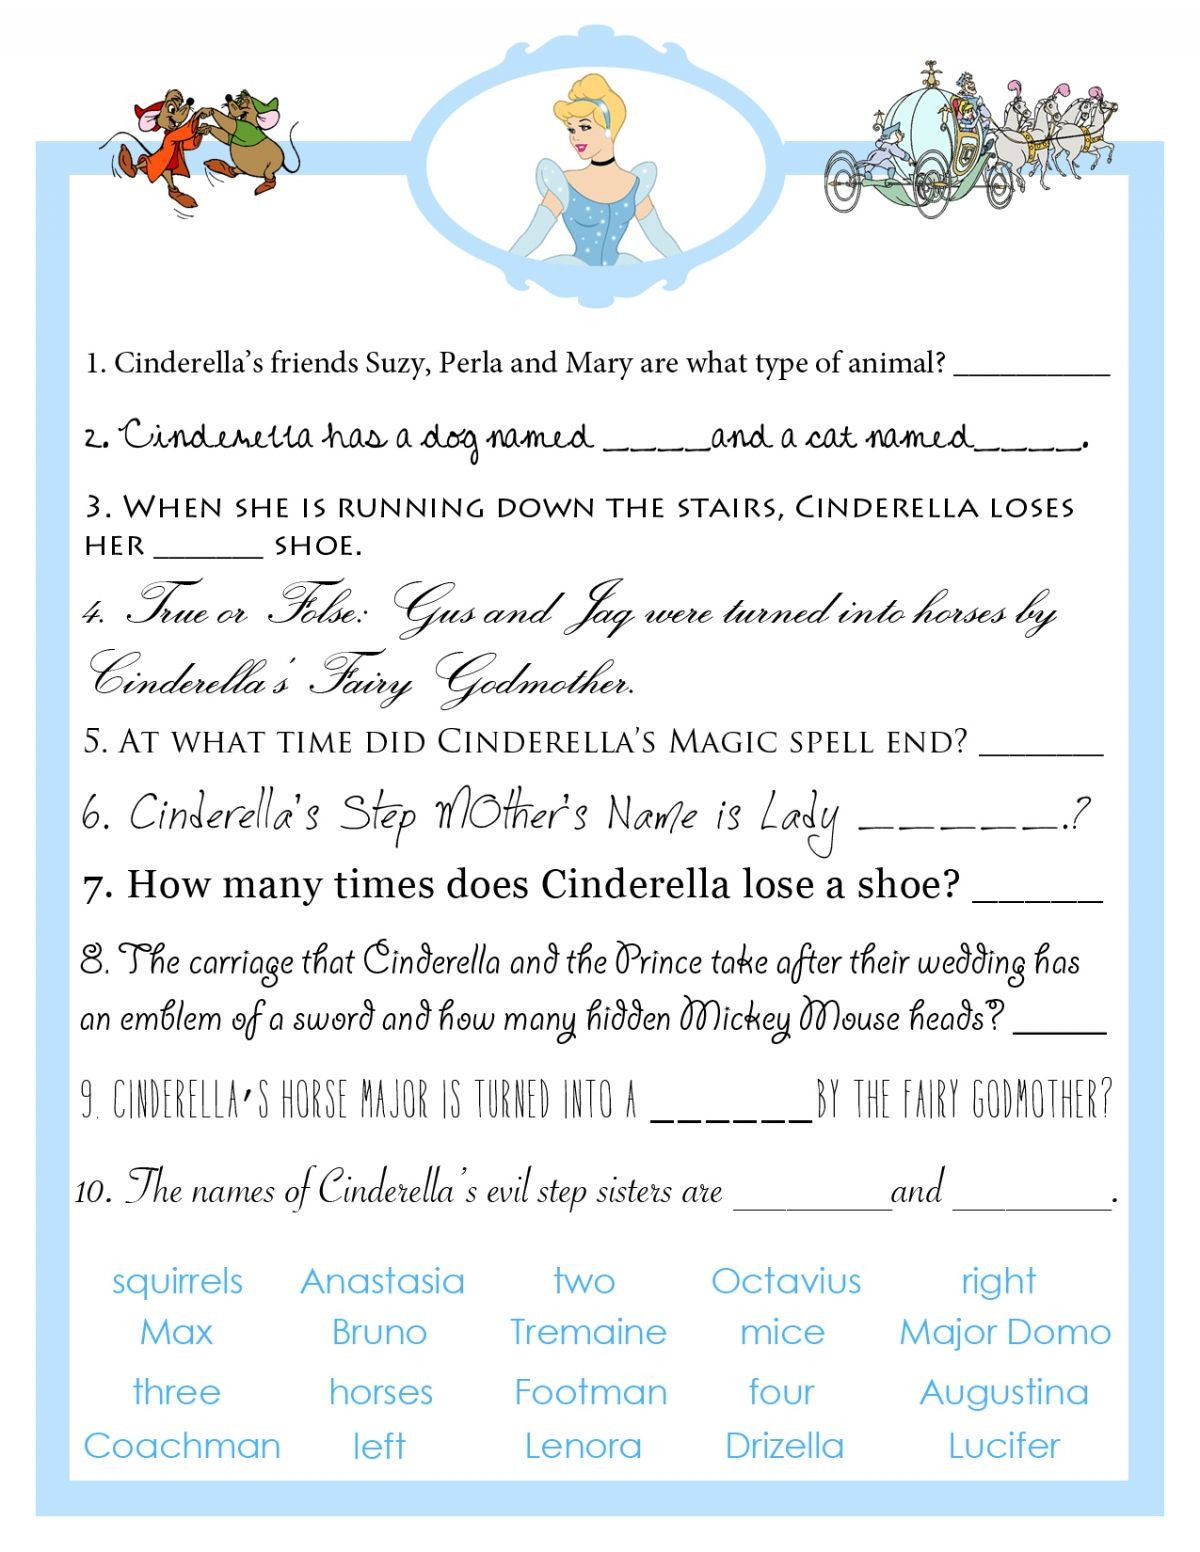 cinderella bridal shower trivia game from bibbidi bobbidi bride httpwww